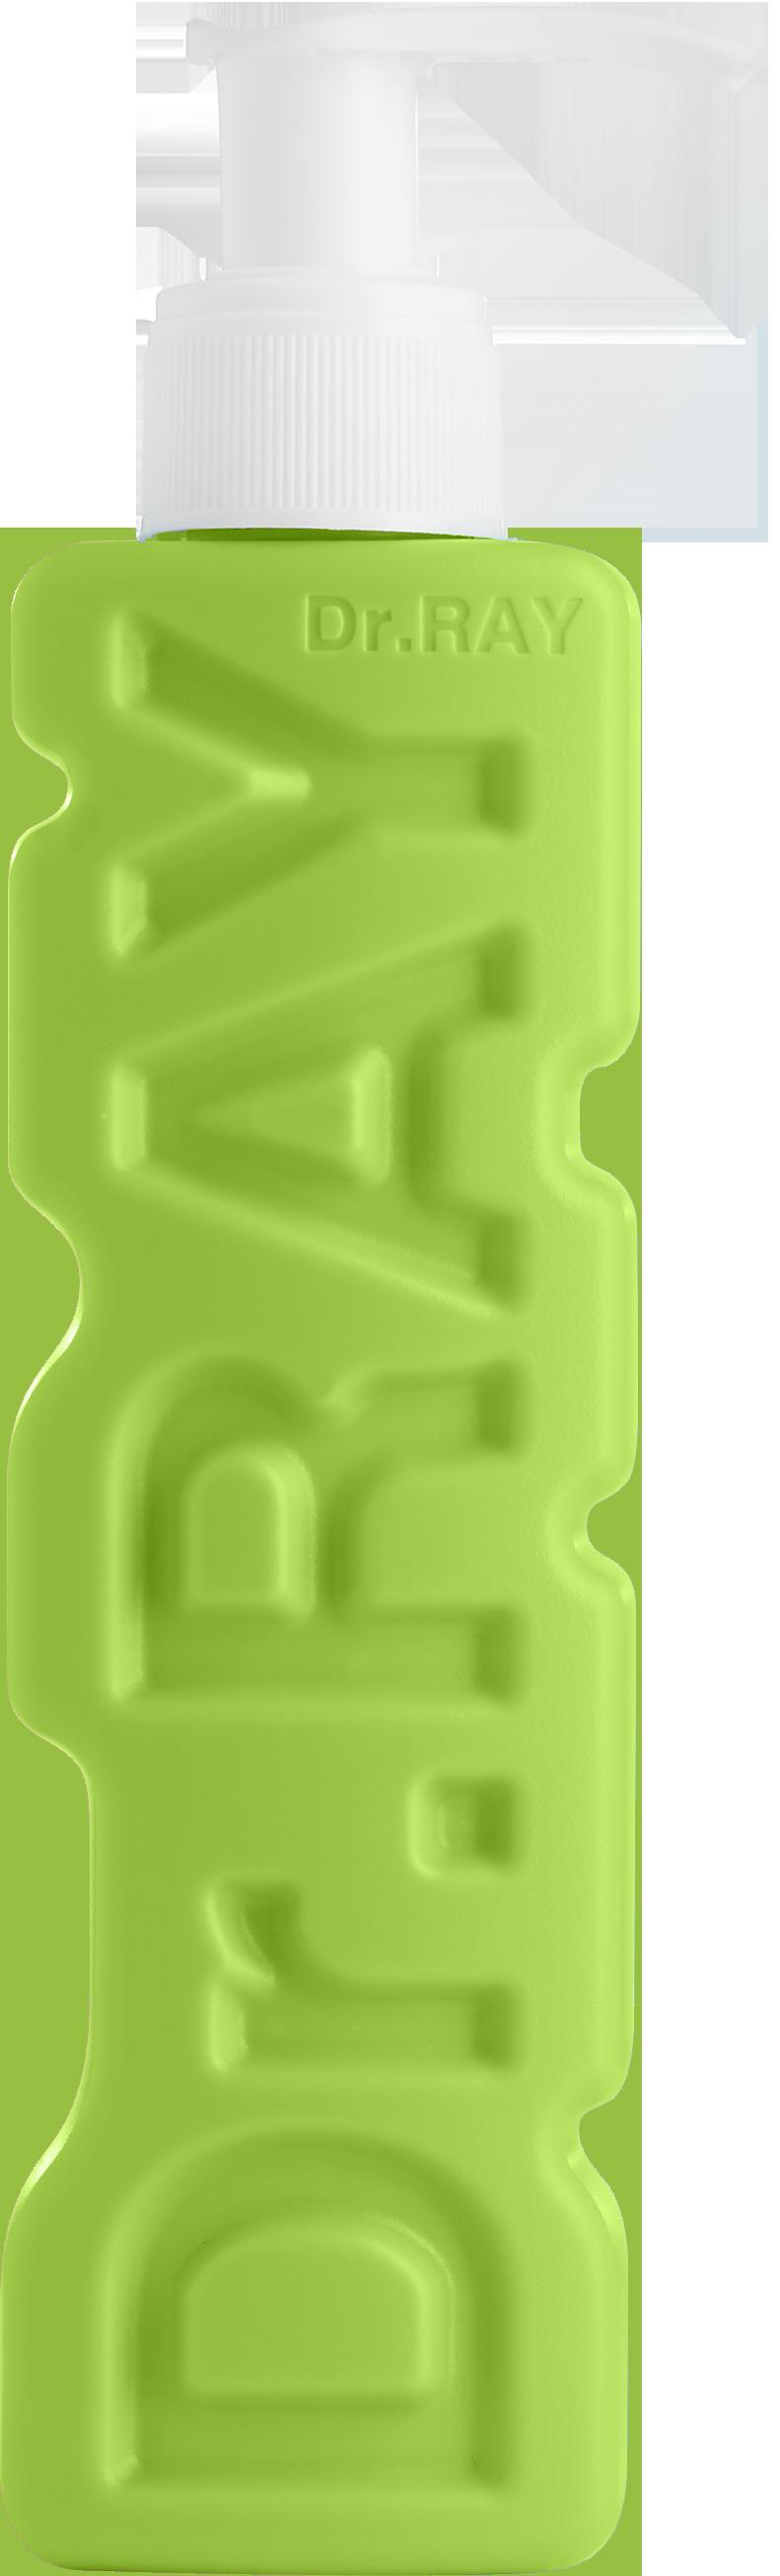 toothpaste wintergreen oil 150g.